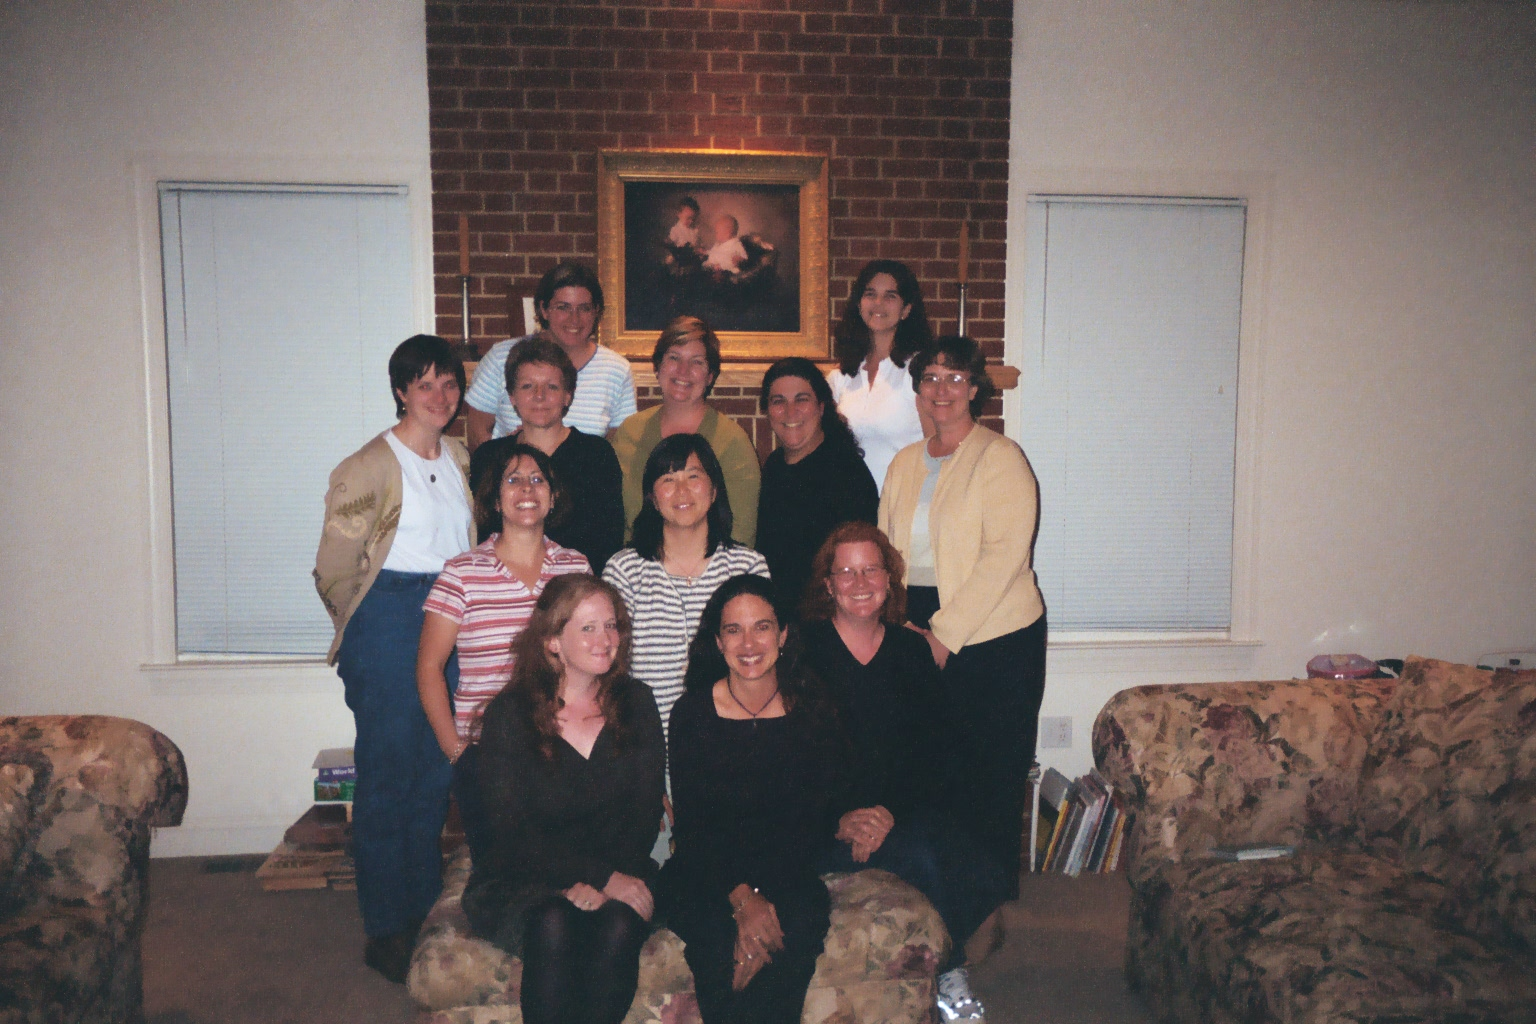 August Moms Baltimore - Oct 2003